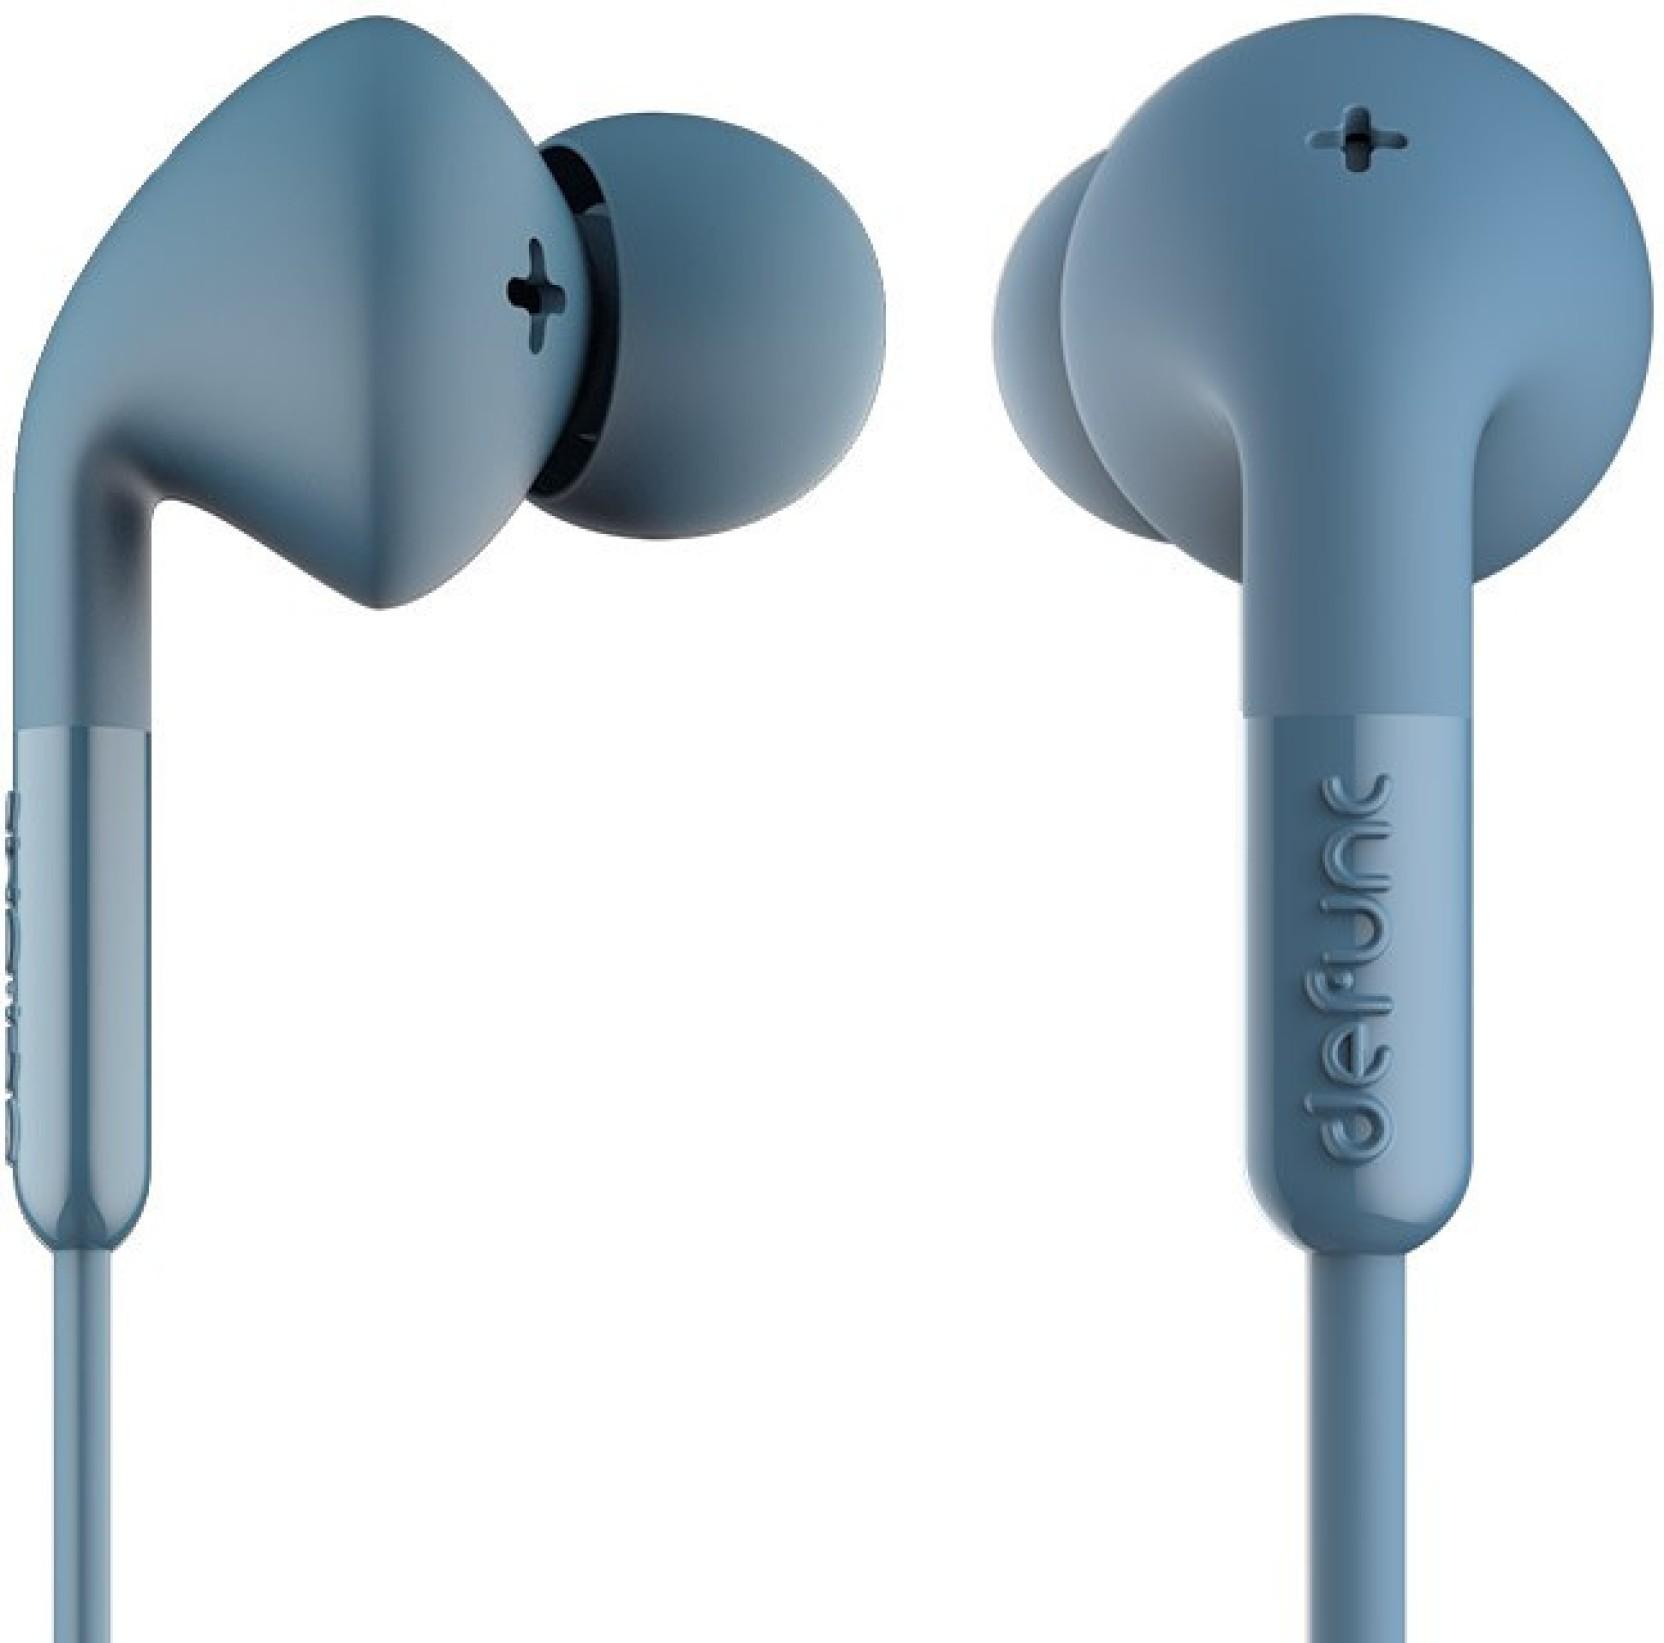 Defunc DEFUNCHANDSFREE280117-008 Headphone Price in India - Buy ... d9c41a43363fa